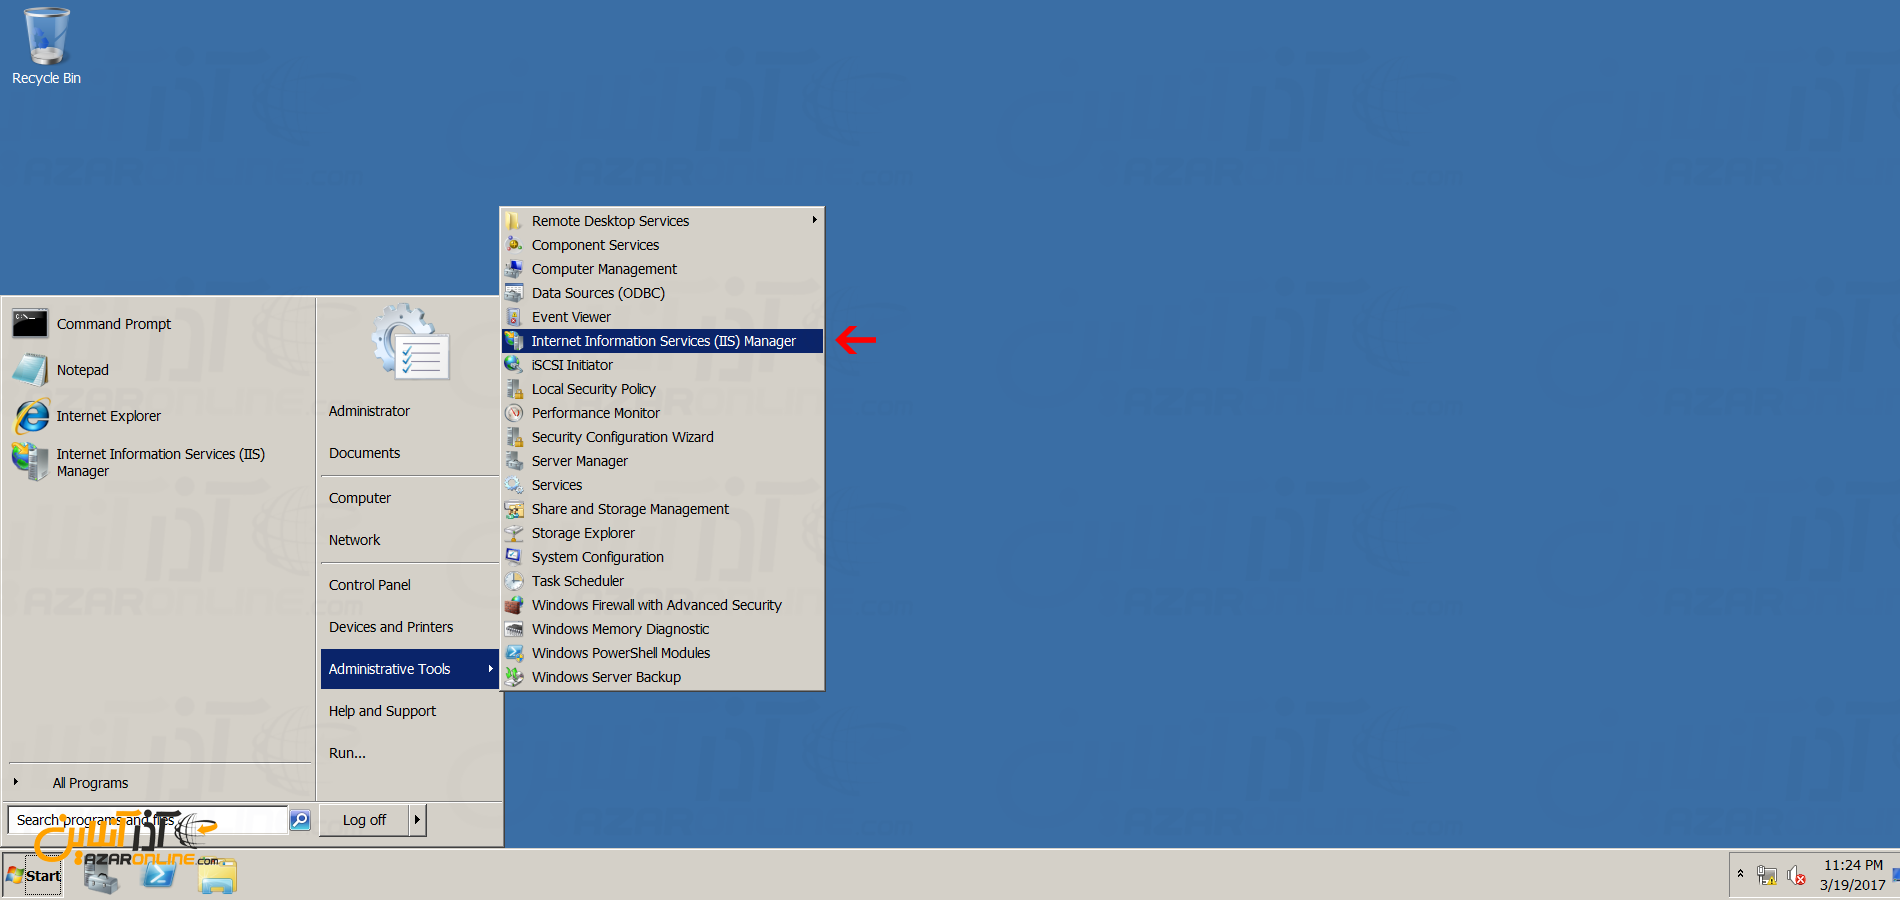 نصب FTP سرور در ویندوز سرور 2008 - مدیریت FTP سرور